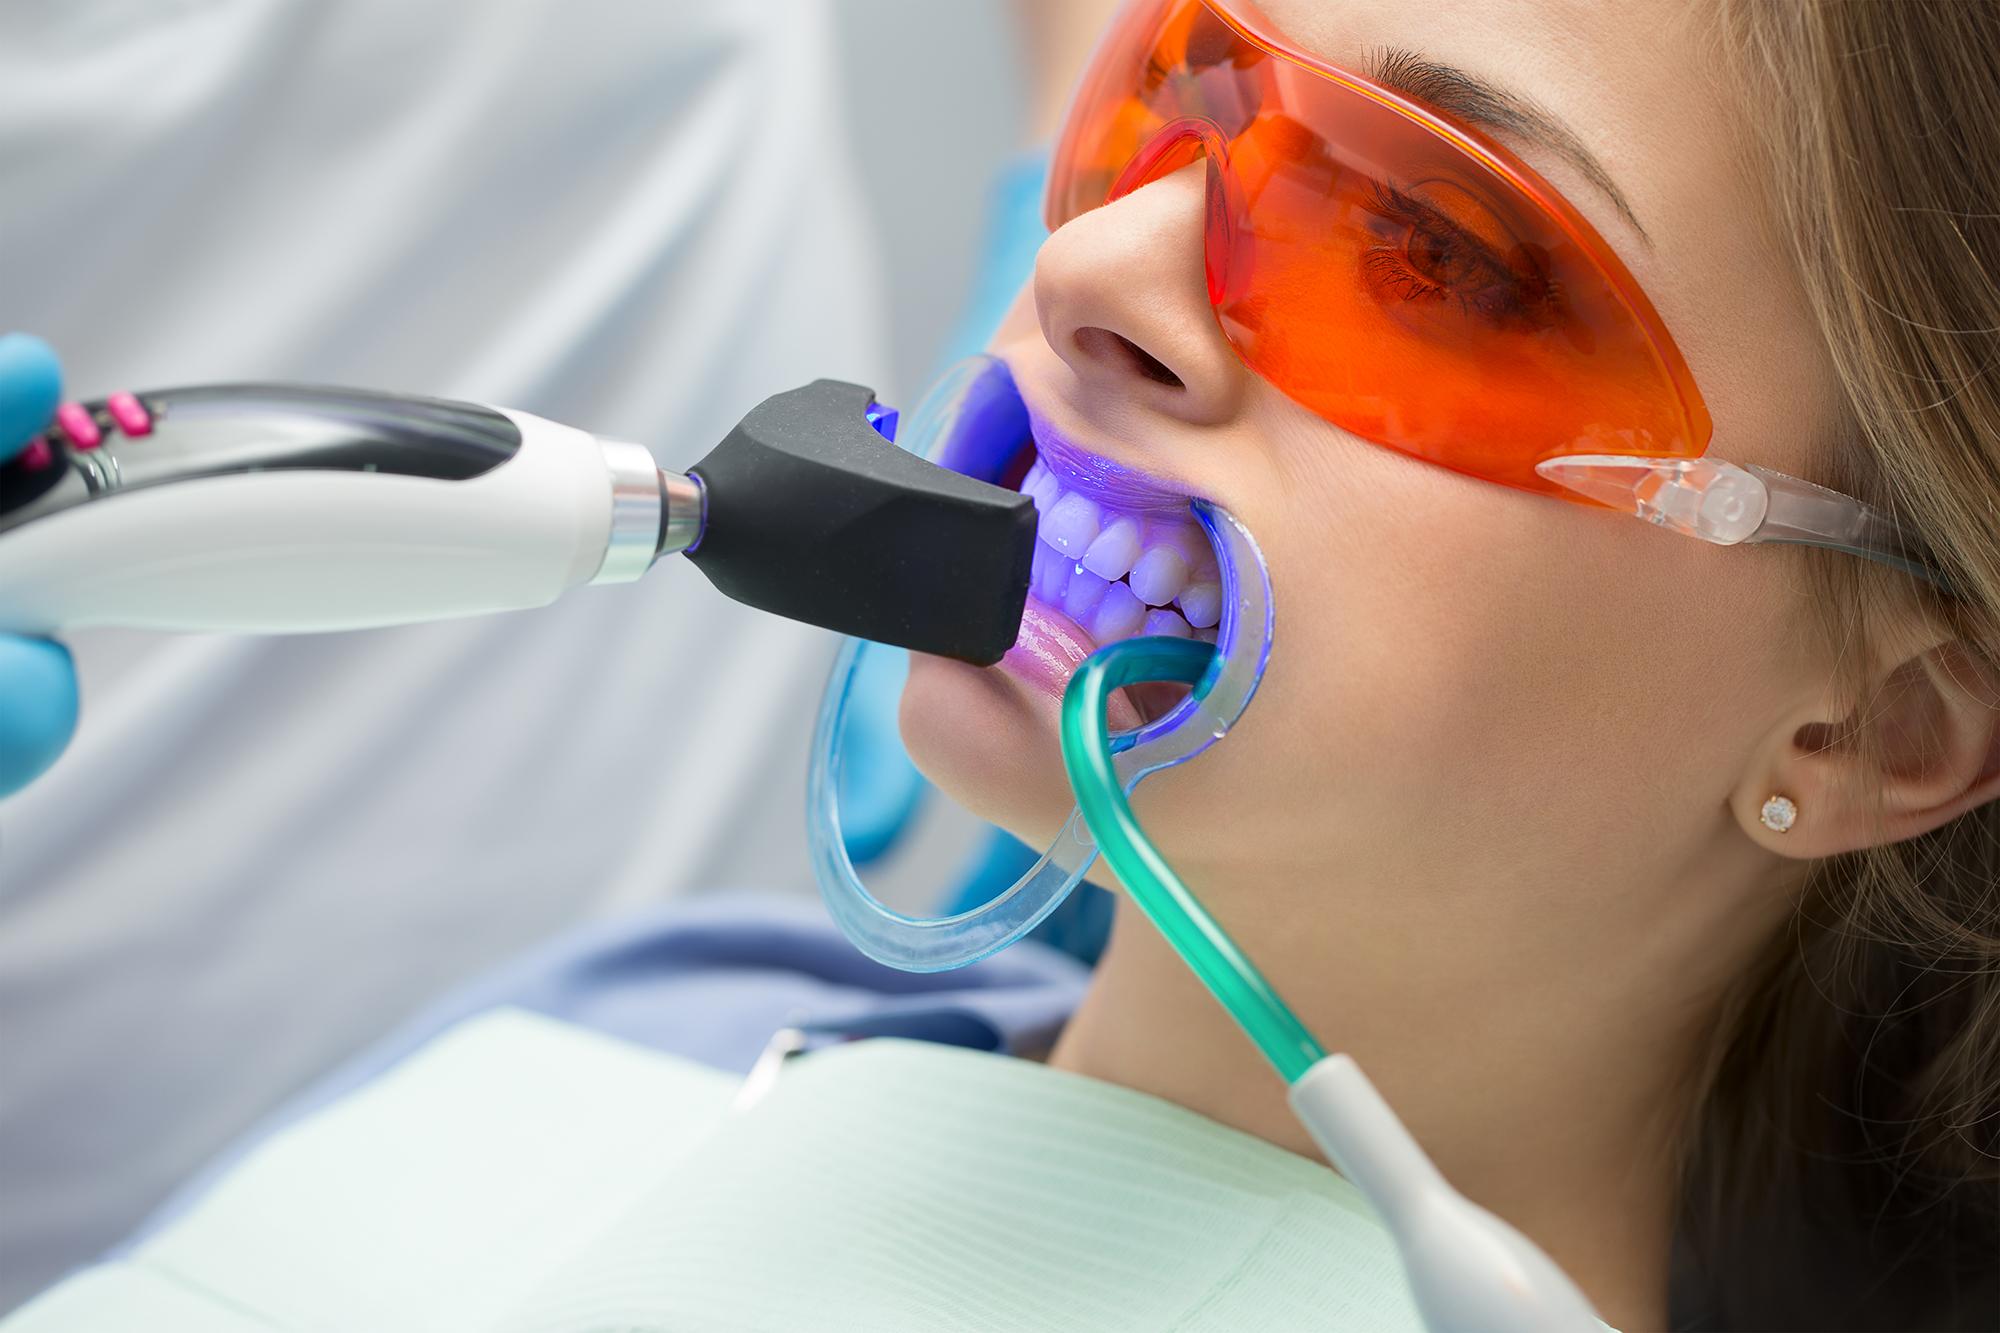 Lakewood Ranch Dental Services - Teeth Whitening